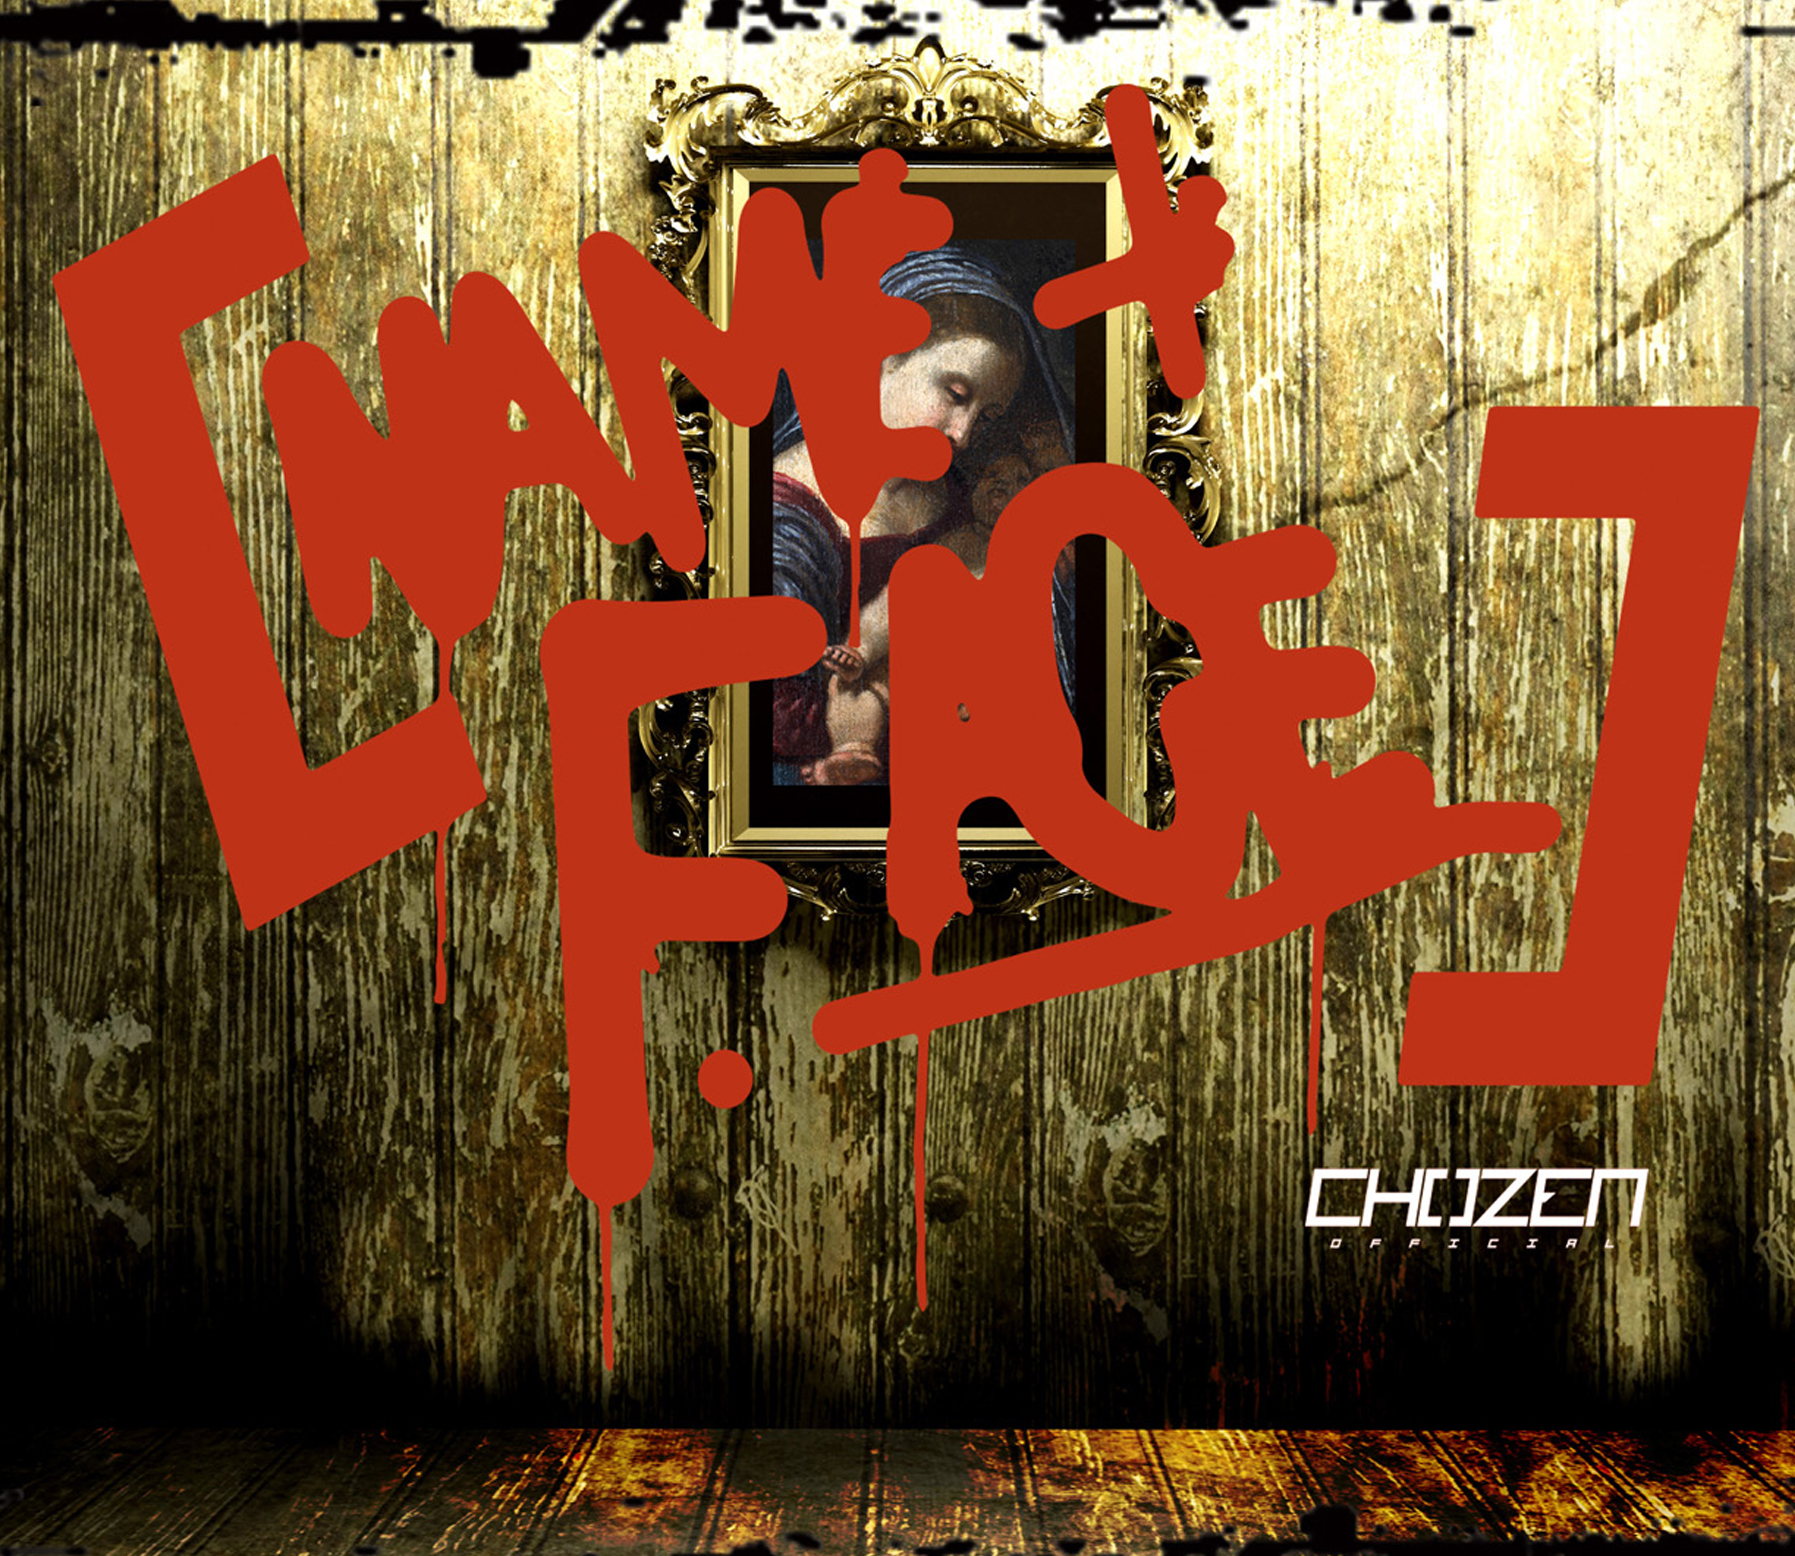 ChozenOfficial